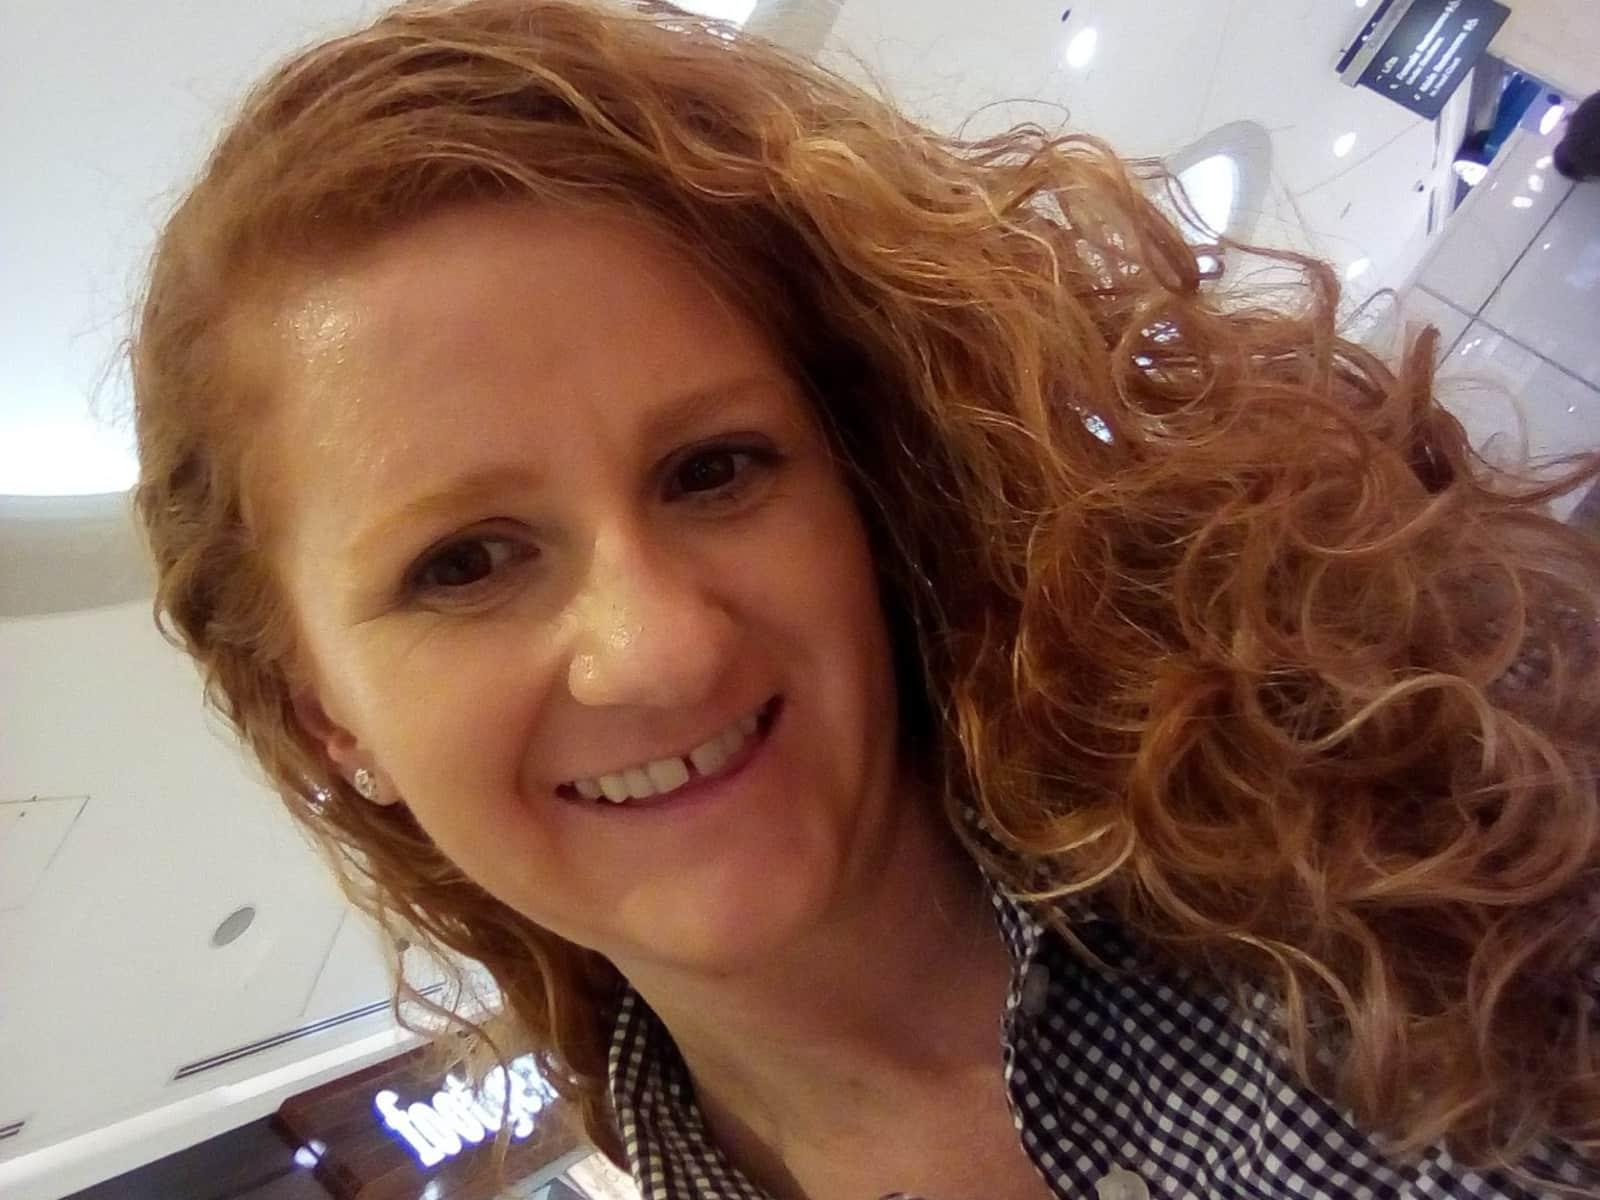 Sarah from Brisbane, Queensland, Australia